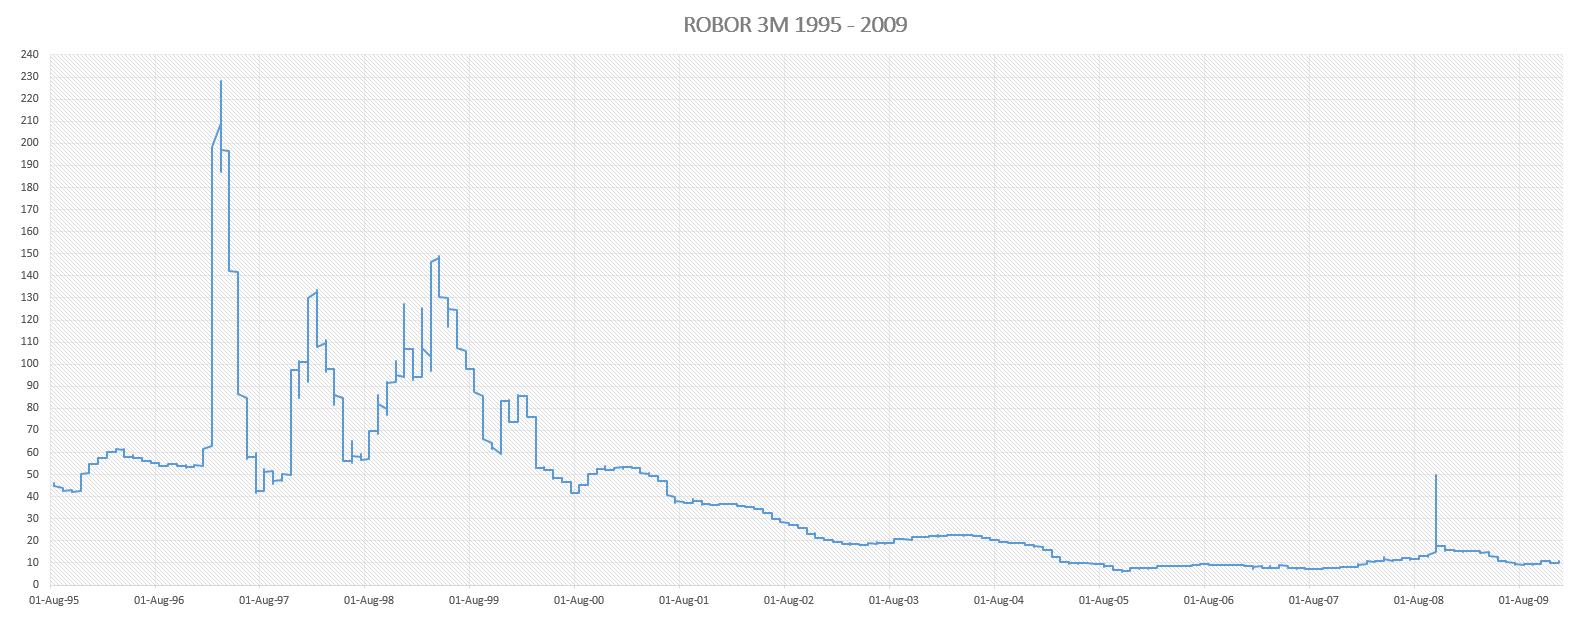 grafic ROBOR 1995 - 2009